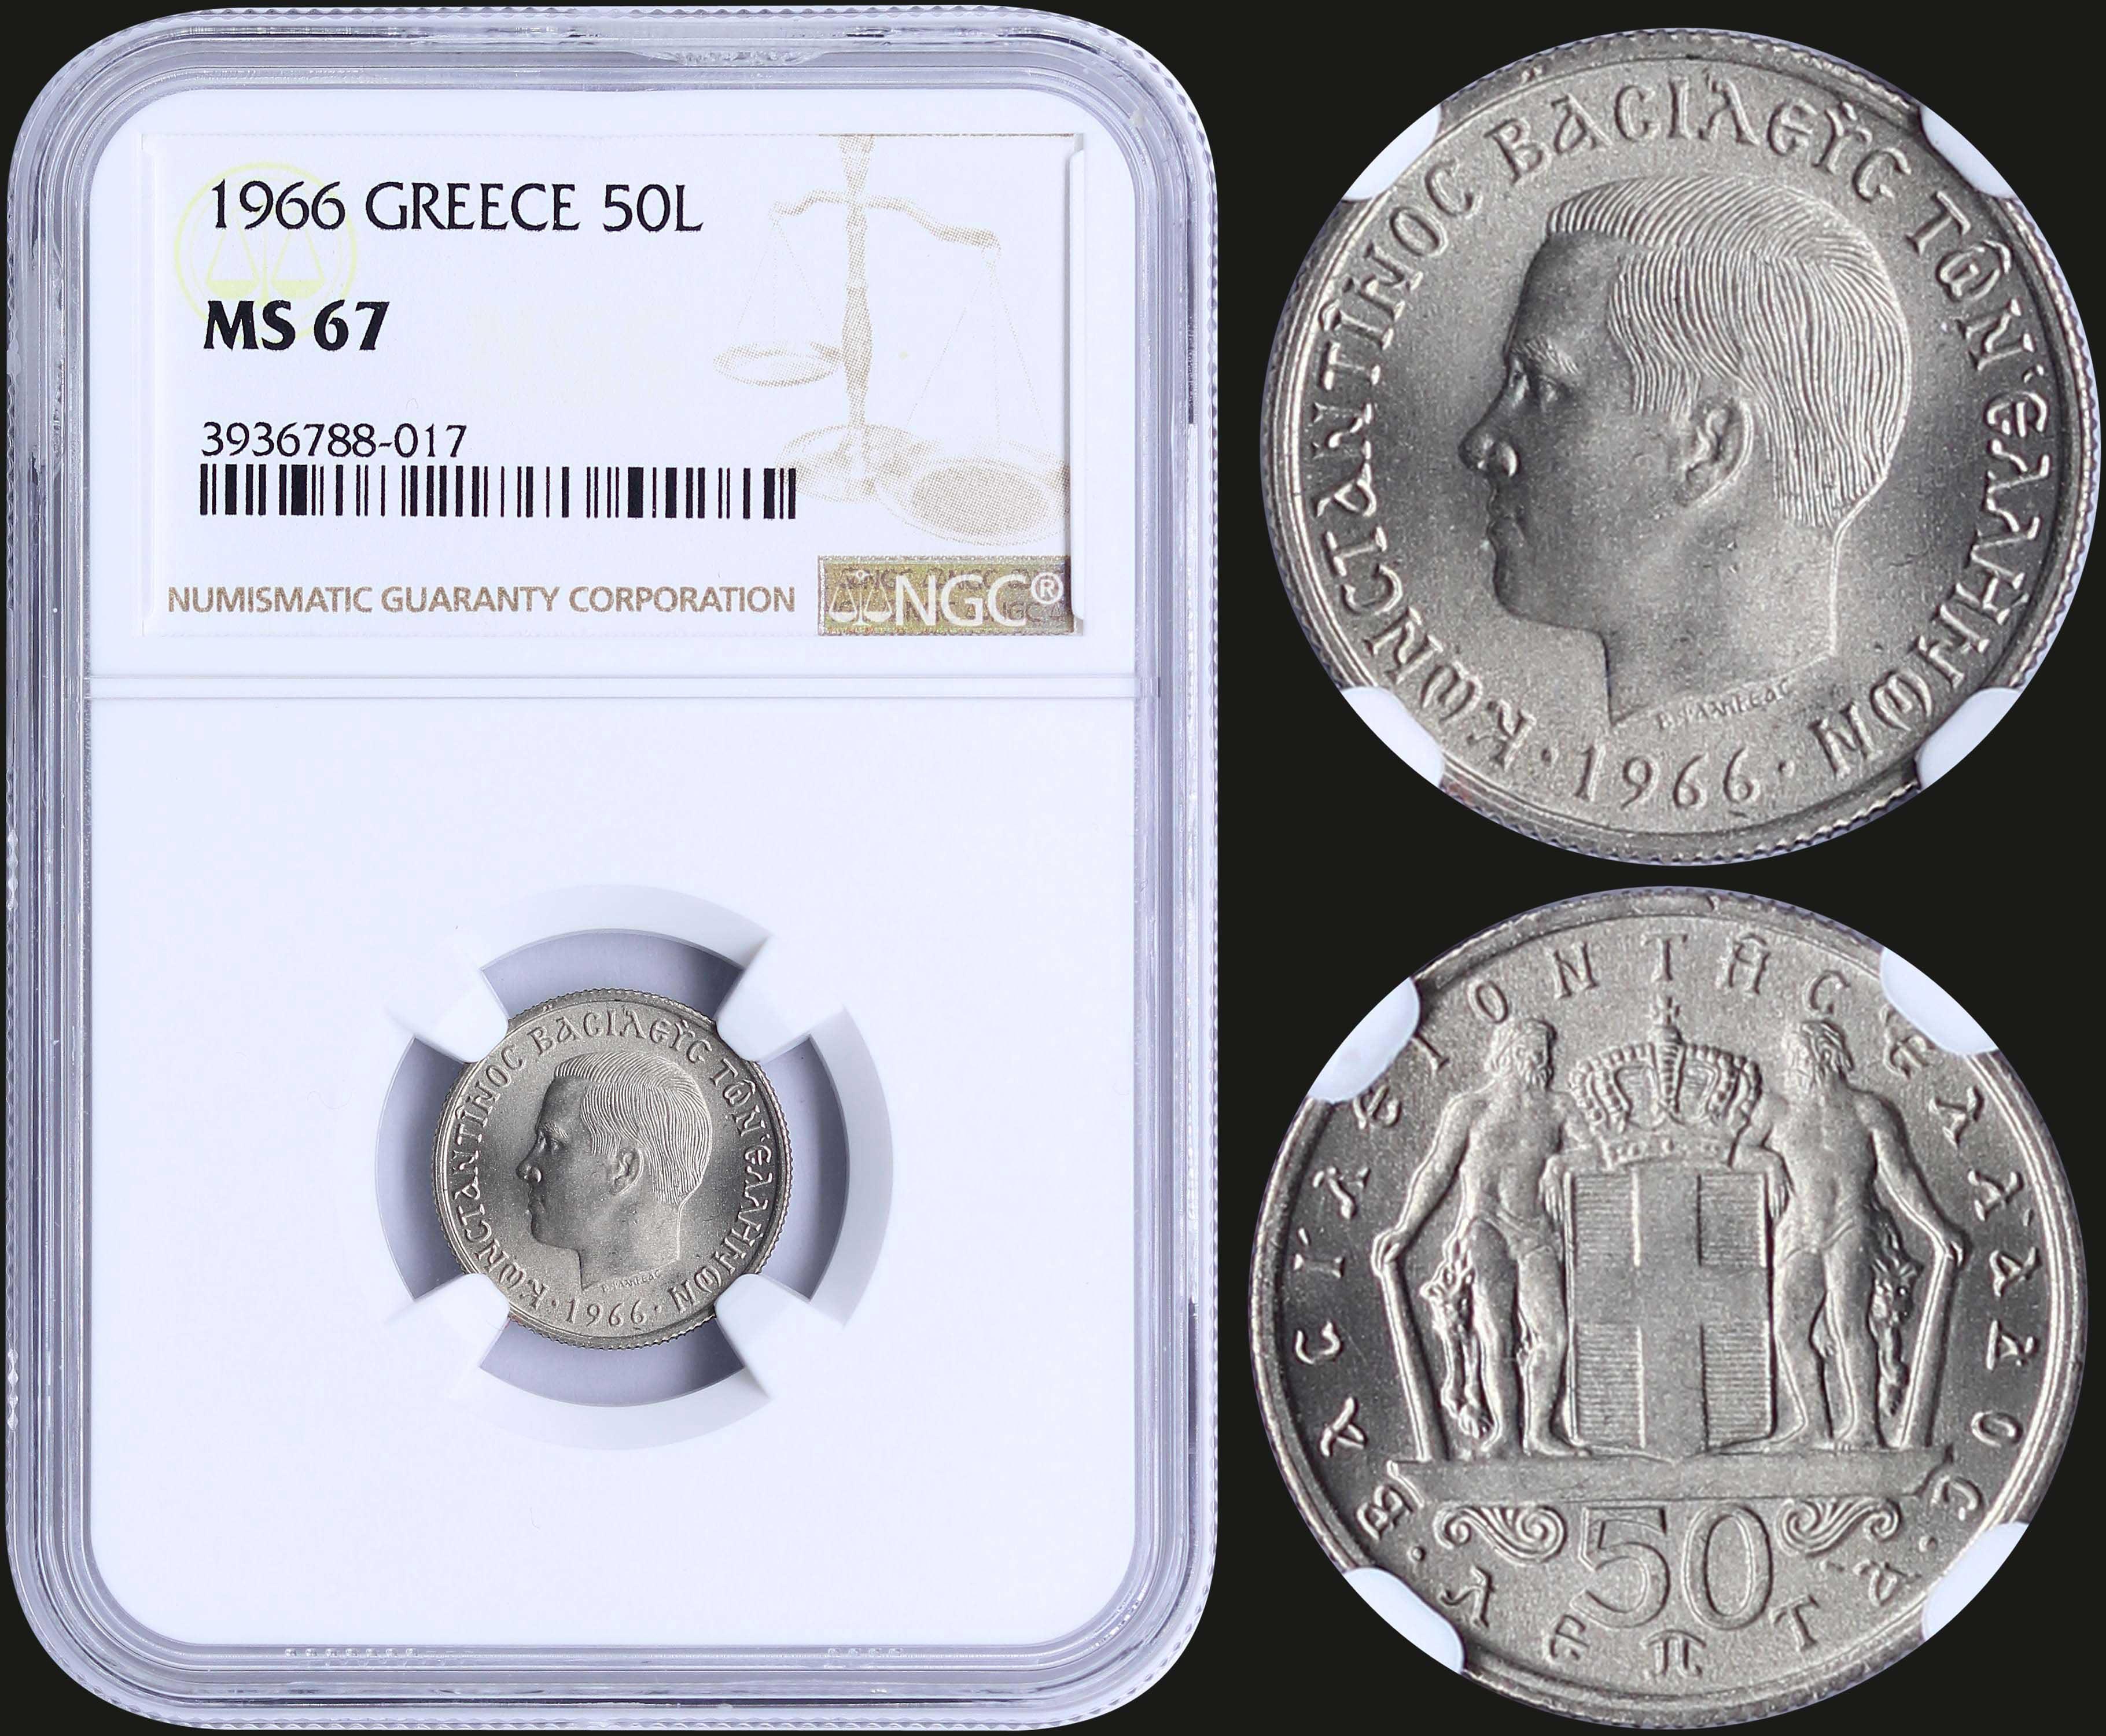 Lot 8204 - -  COINS & TOKENS king constantine ii -  A. Karamitsos Public & Live Bid Auction 644 Coins, Medals & Banknotes